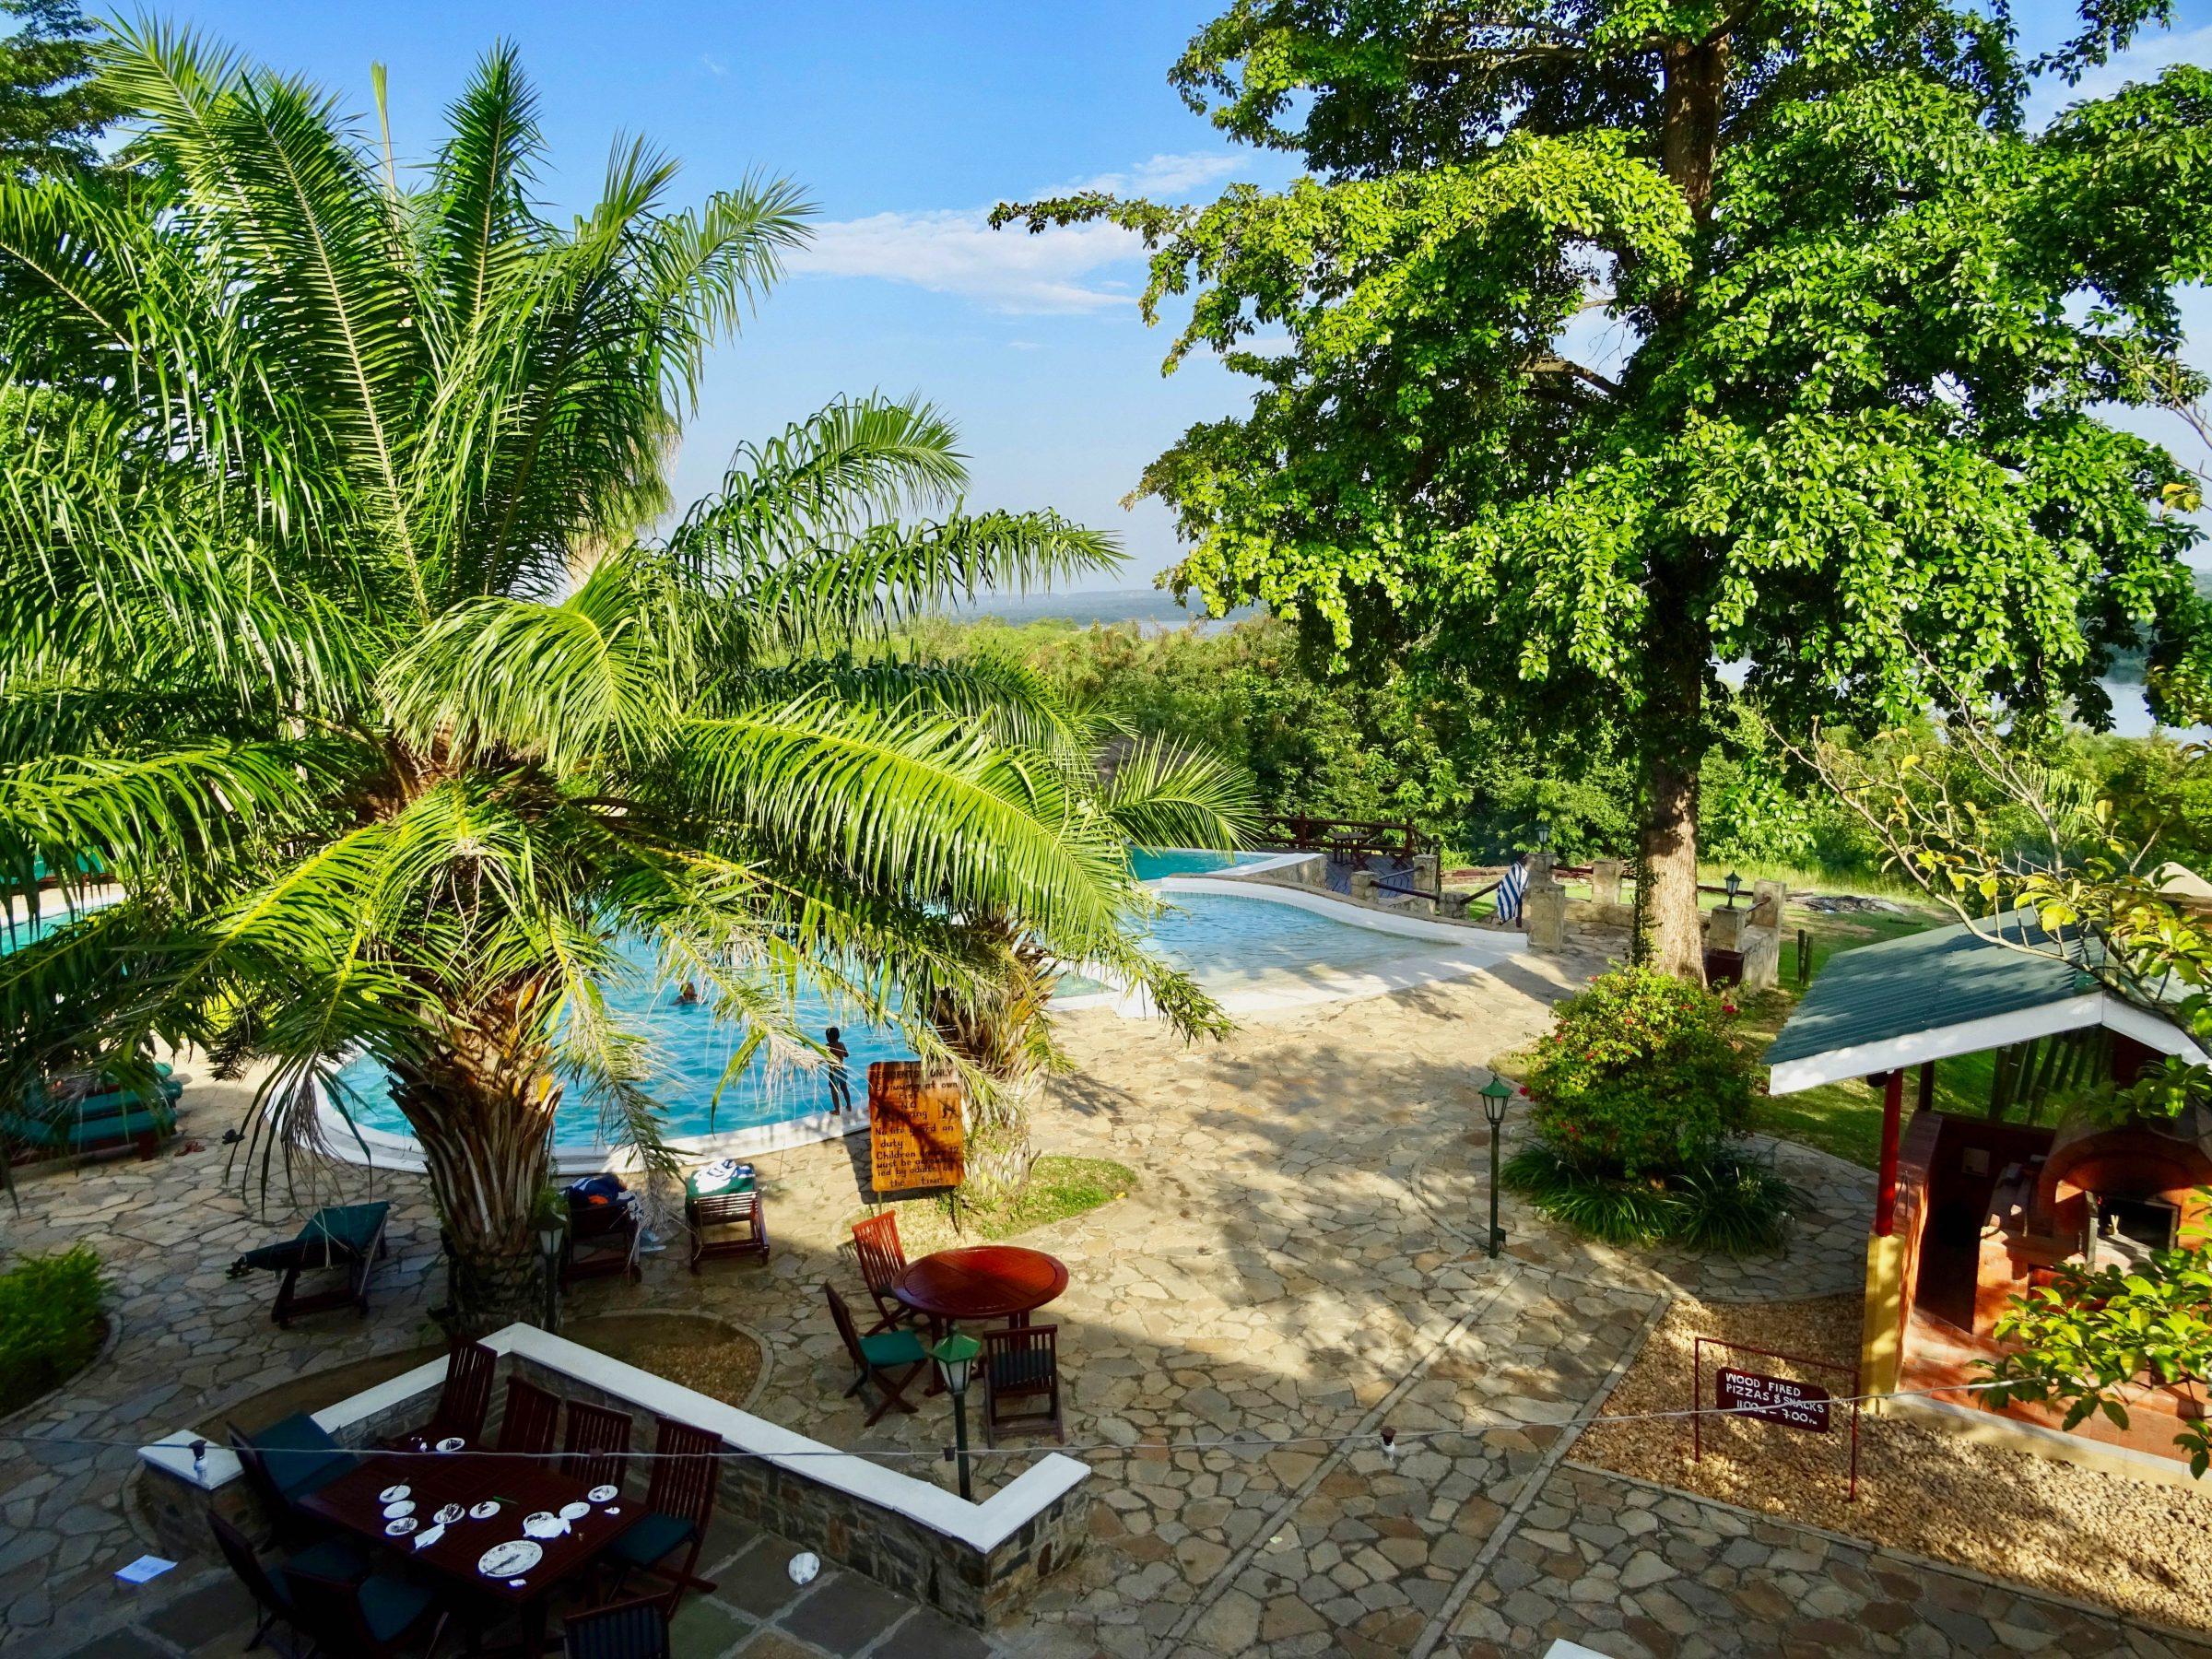 Zwembad Paraa Safari Lodge, Murchison Falls